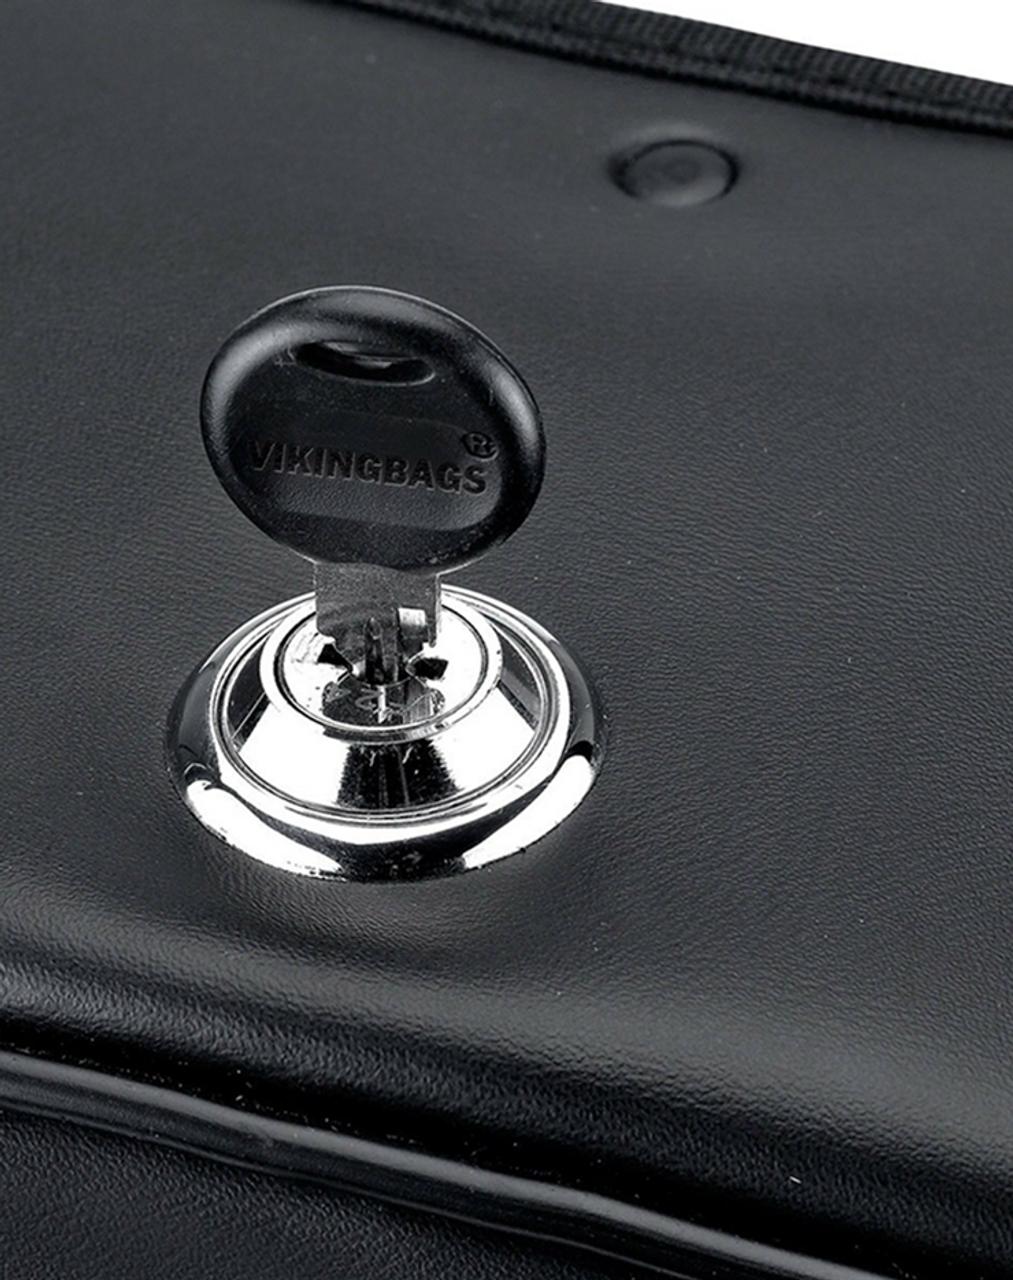 Suzuki Boulevard M90 VikingBags Overlord Large Side Pocket Saddlebags Key Lockable View